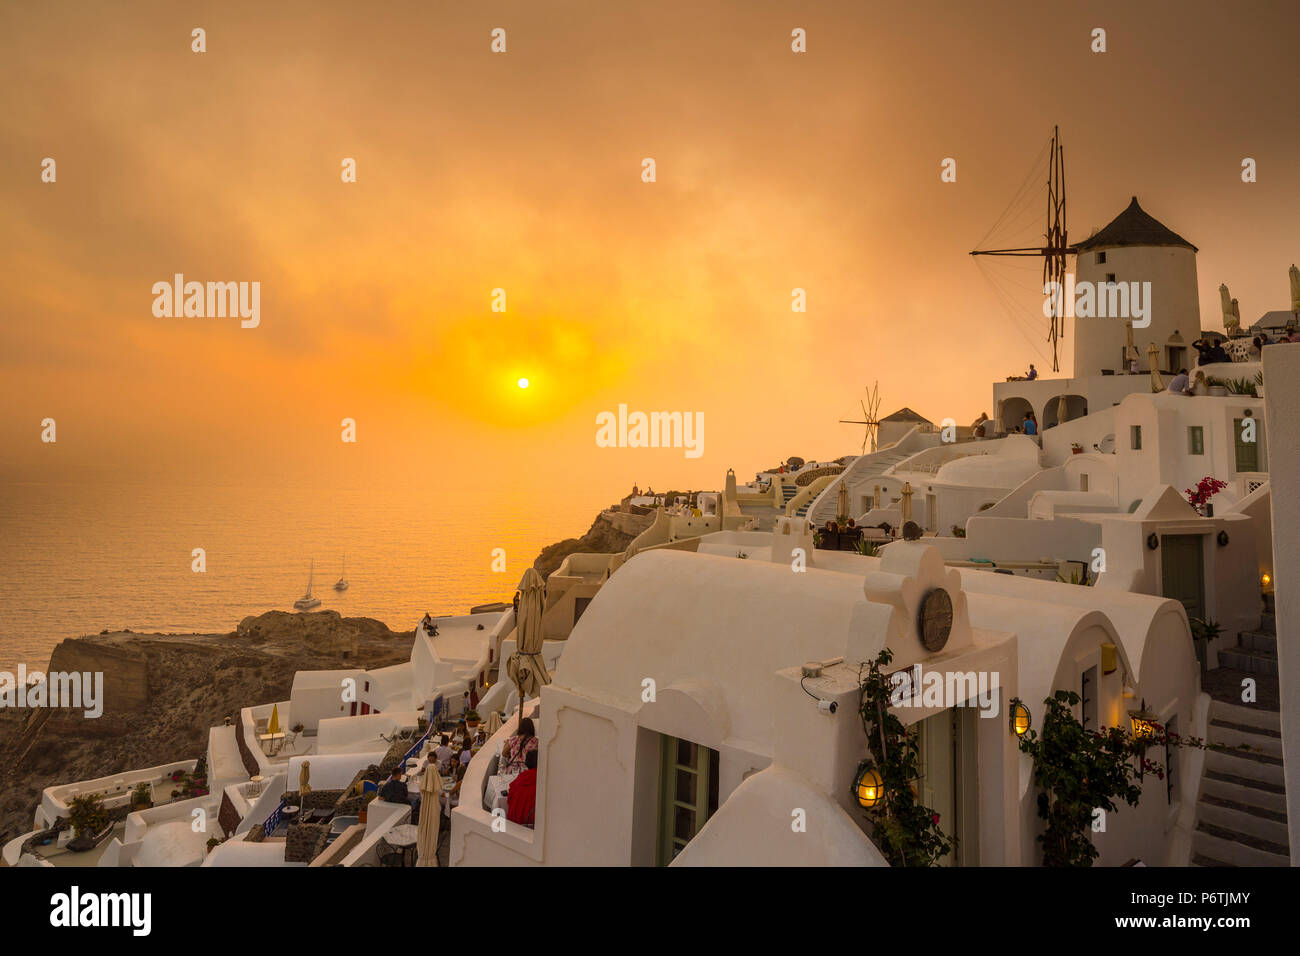 Windmill, Oia, Santorini (Thira), Cyclades Islands, Greece - Stock Image